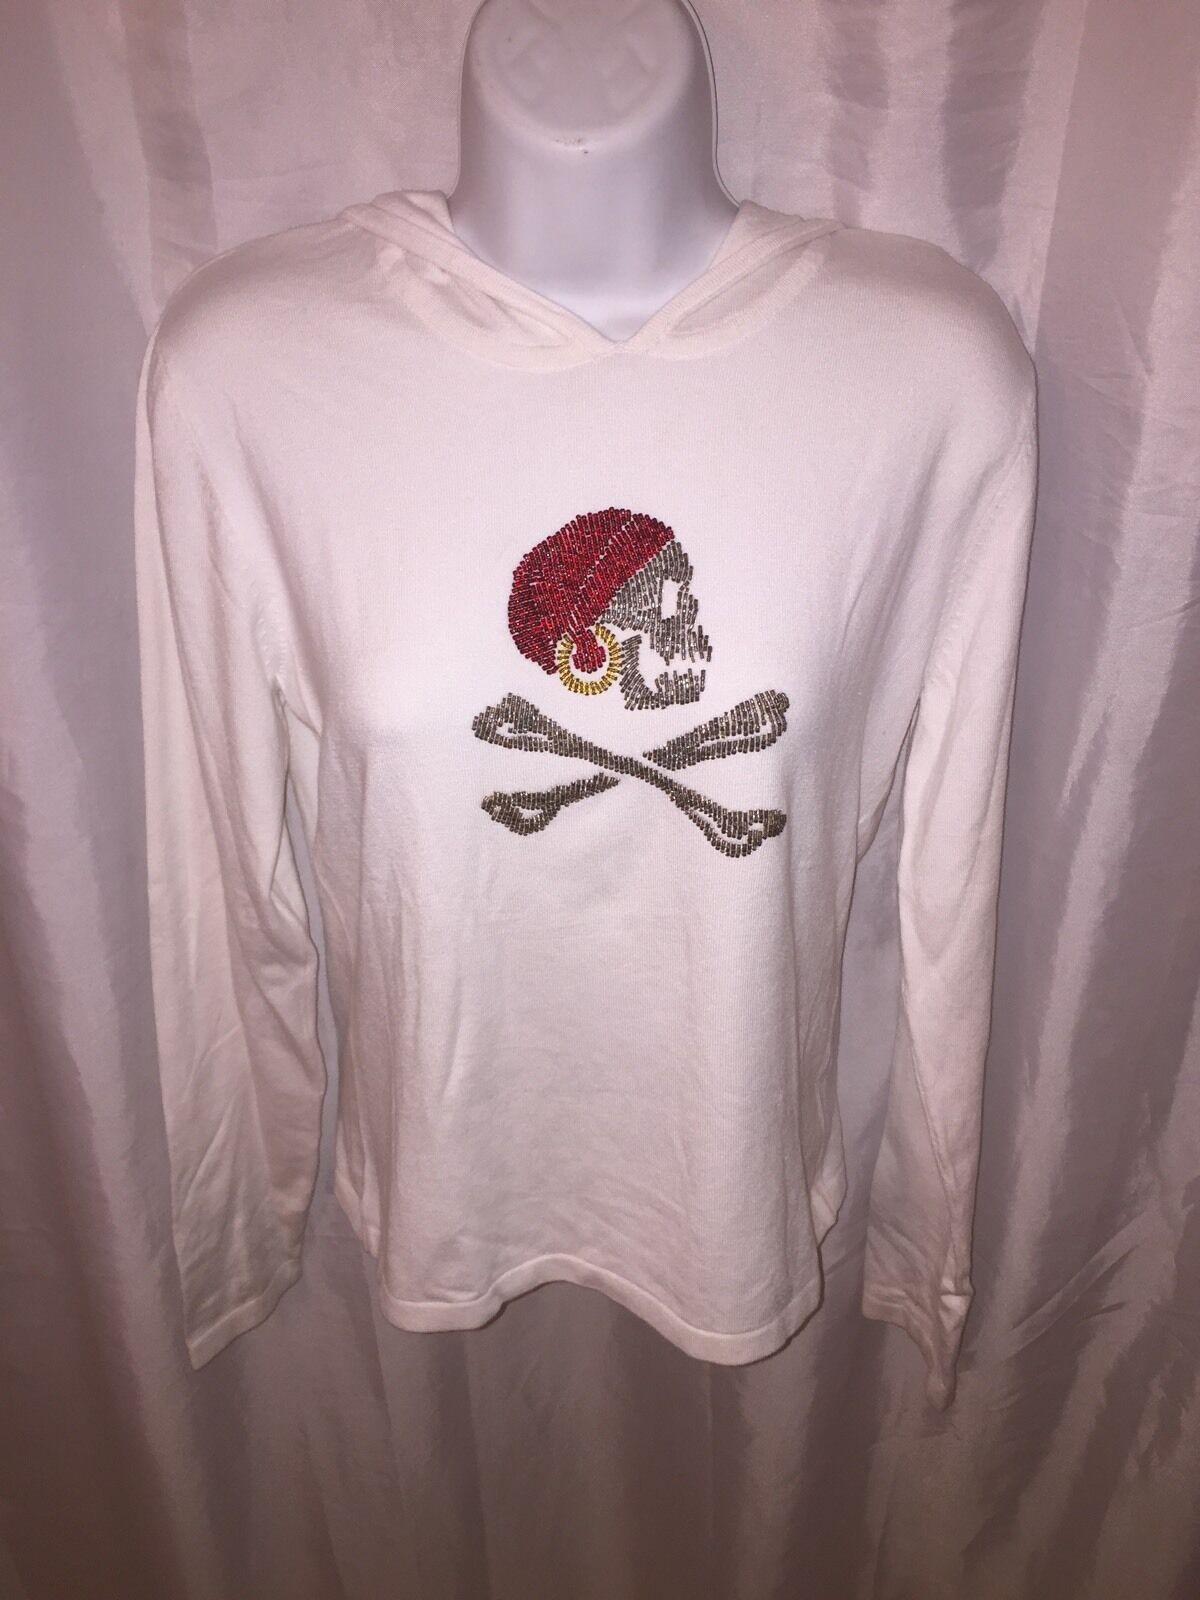 Nwt J. McGloughlin SIZE SMALL white cotton hoodie w beaded SKULL & X-Bones